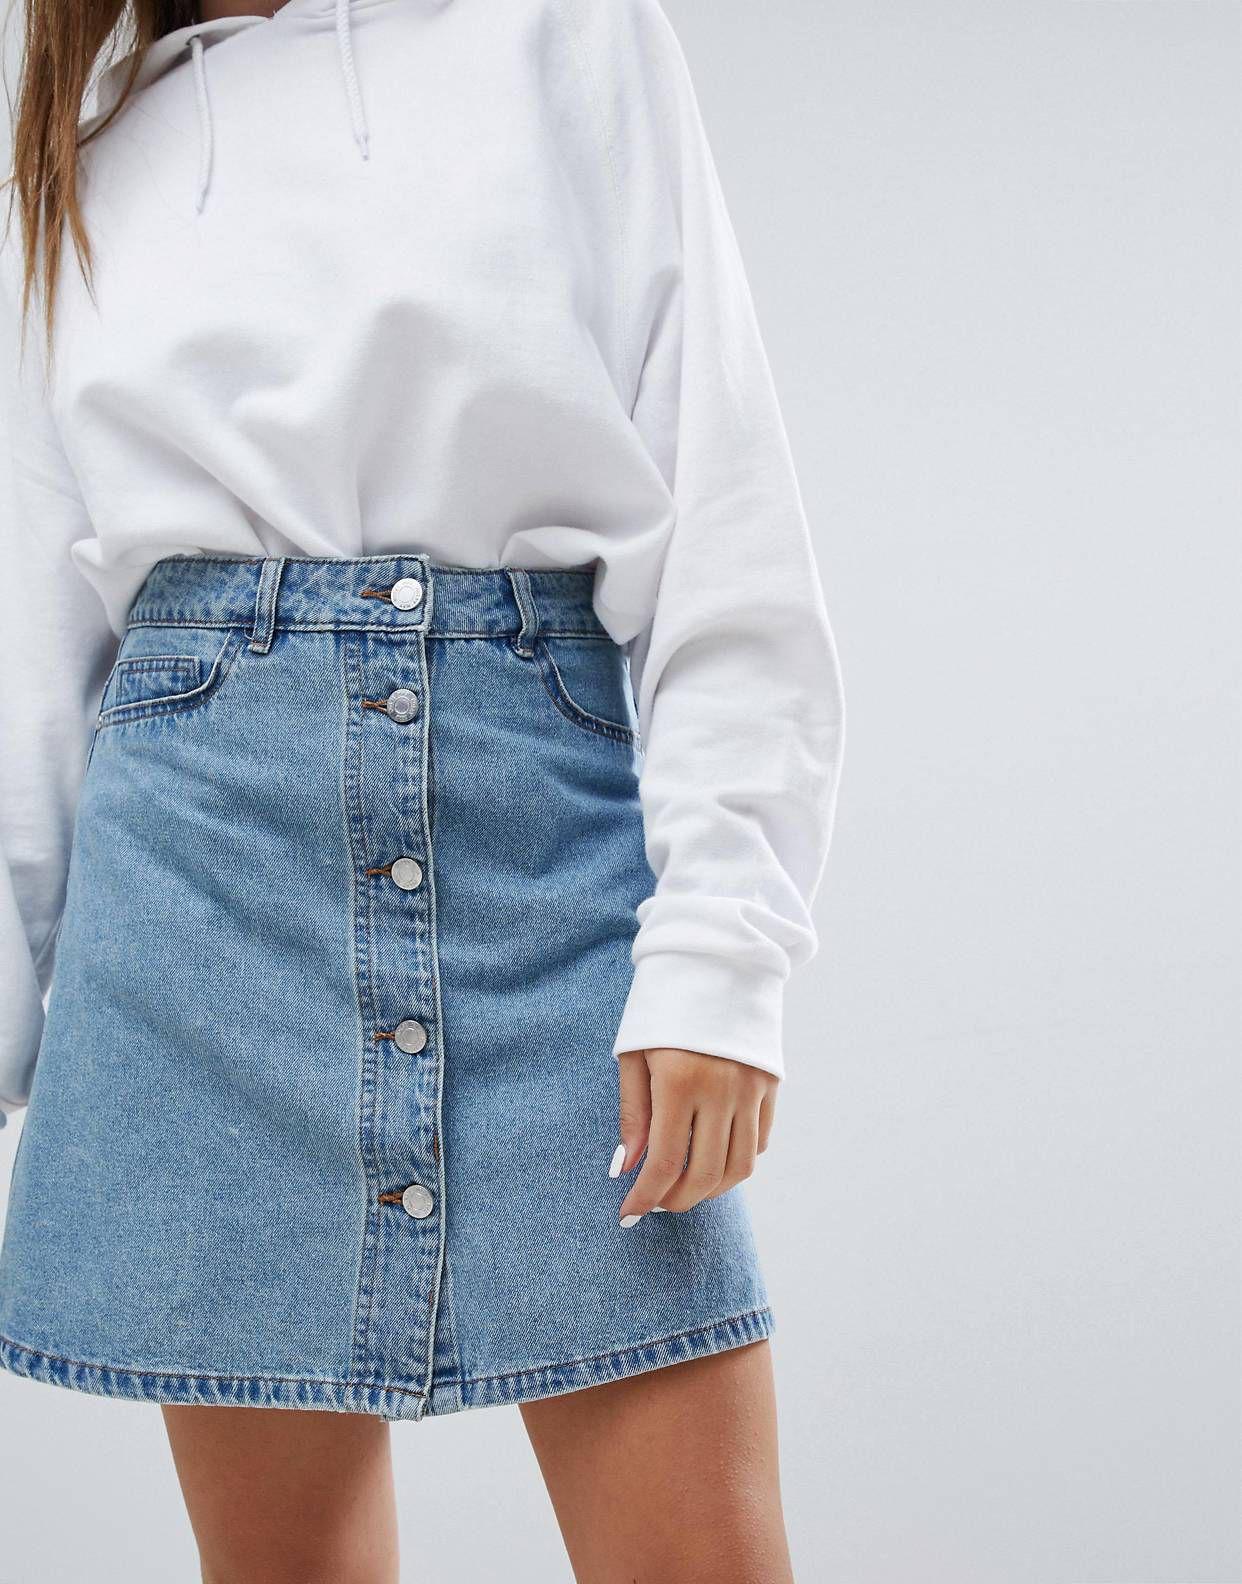 White and blue attire ideas with jean short, miniskirt, skirt